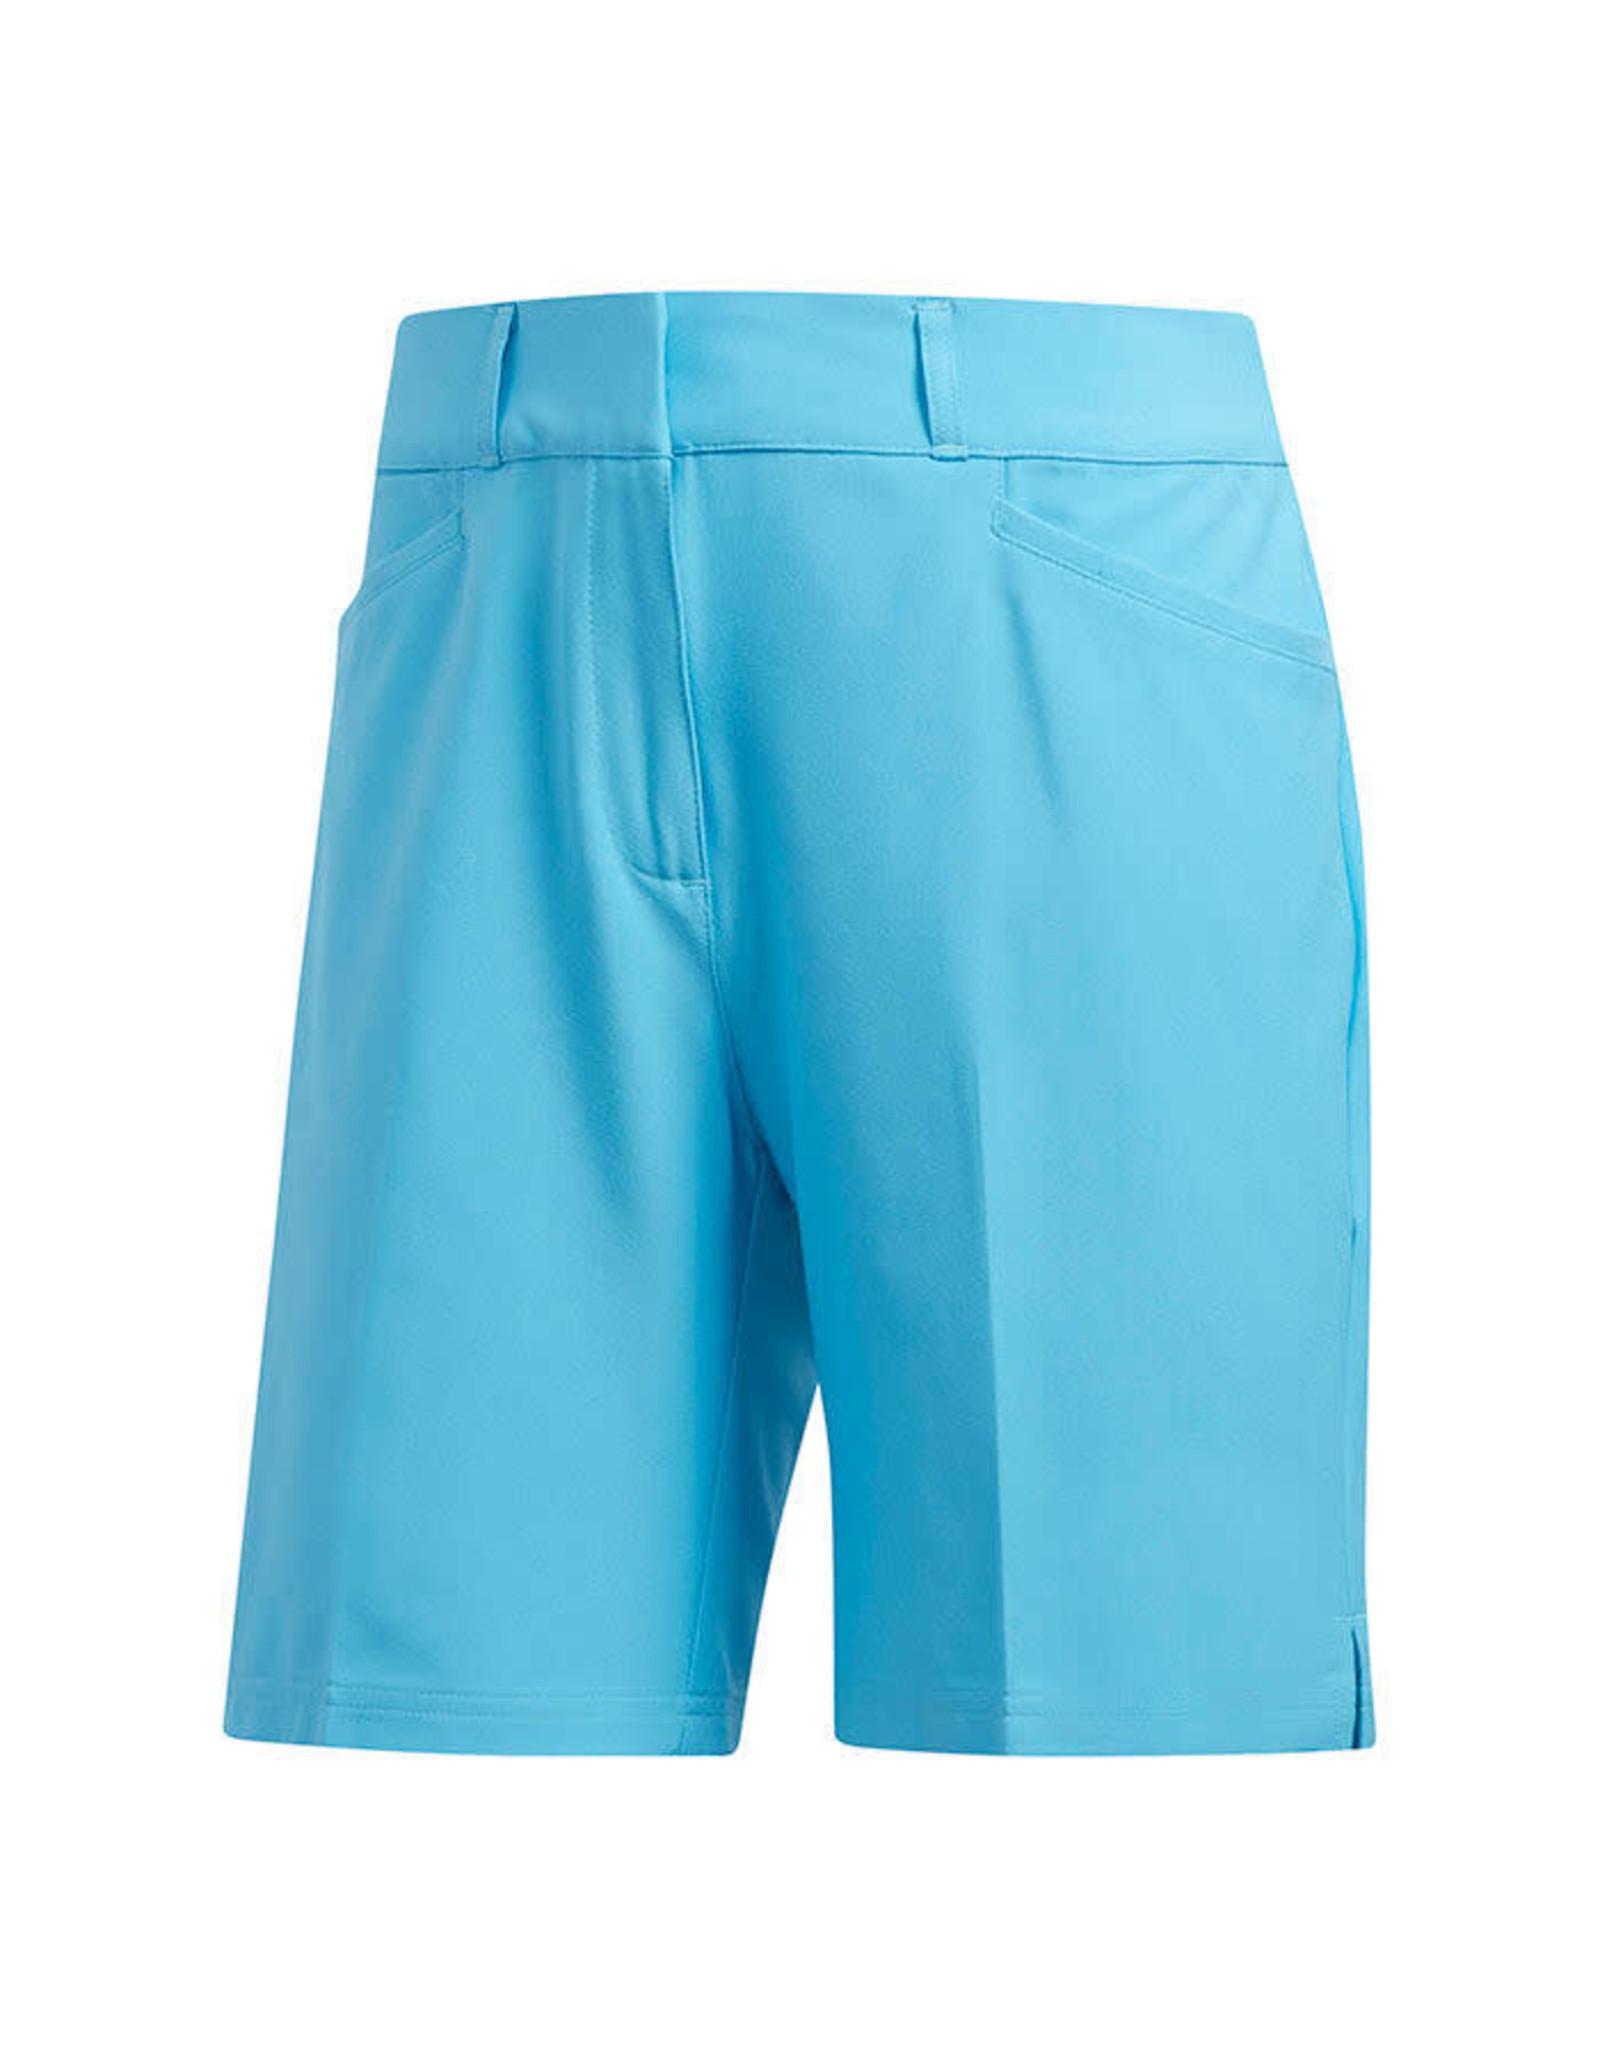 Adidas Adidas Women's Shorts (DU0797)